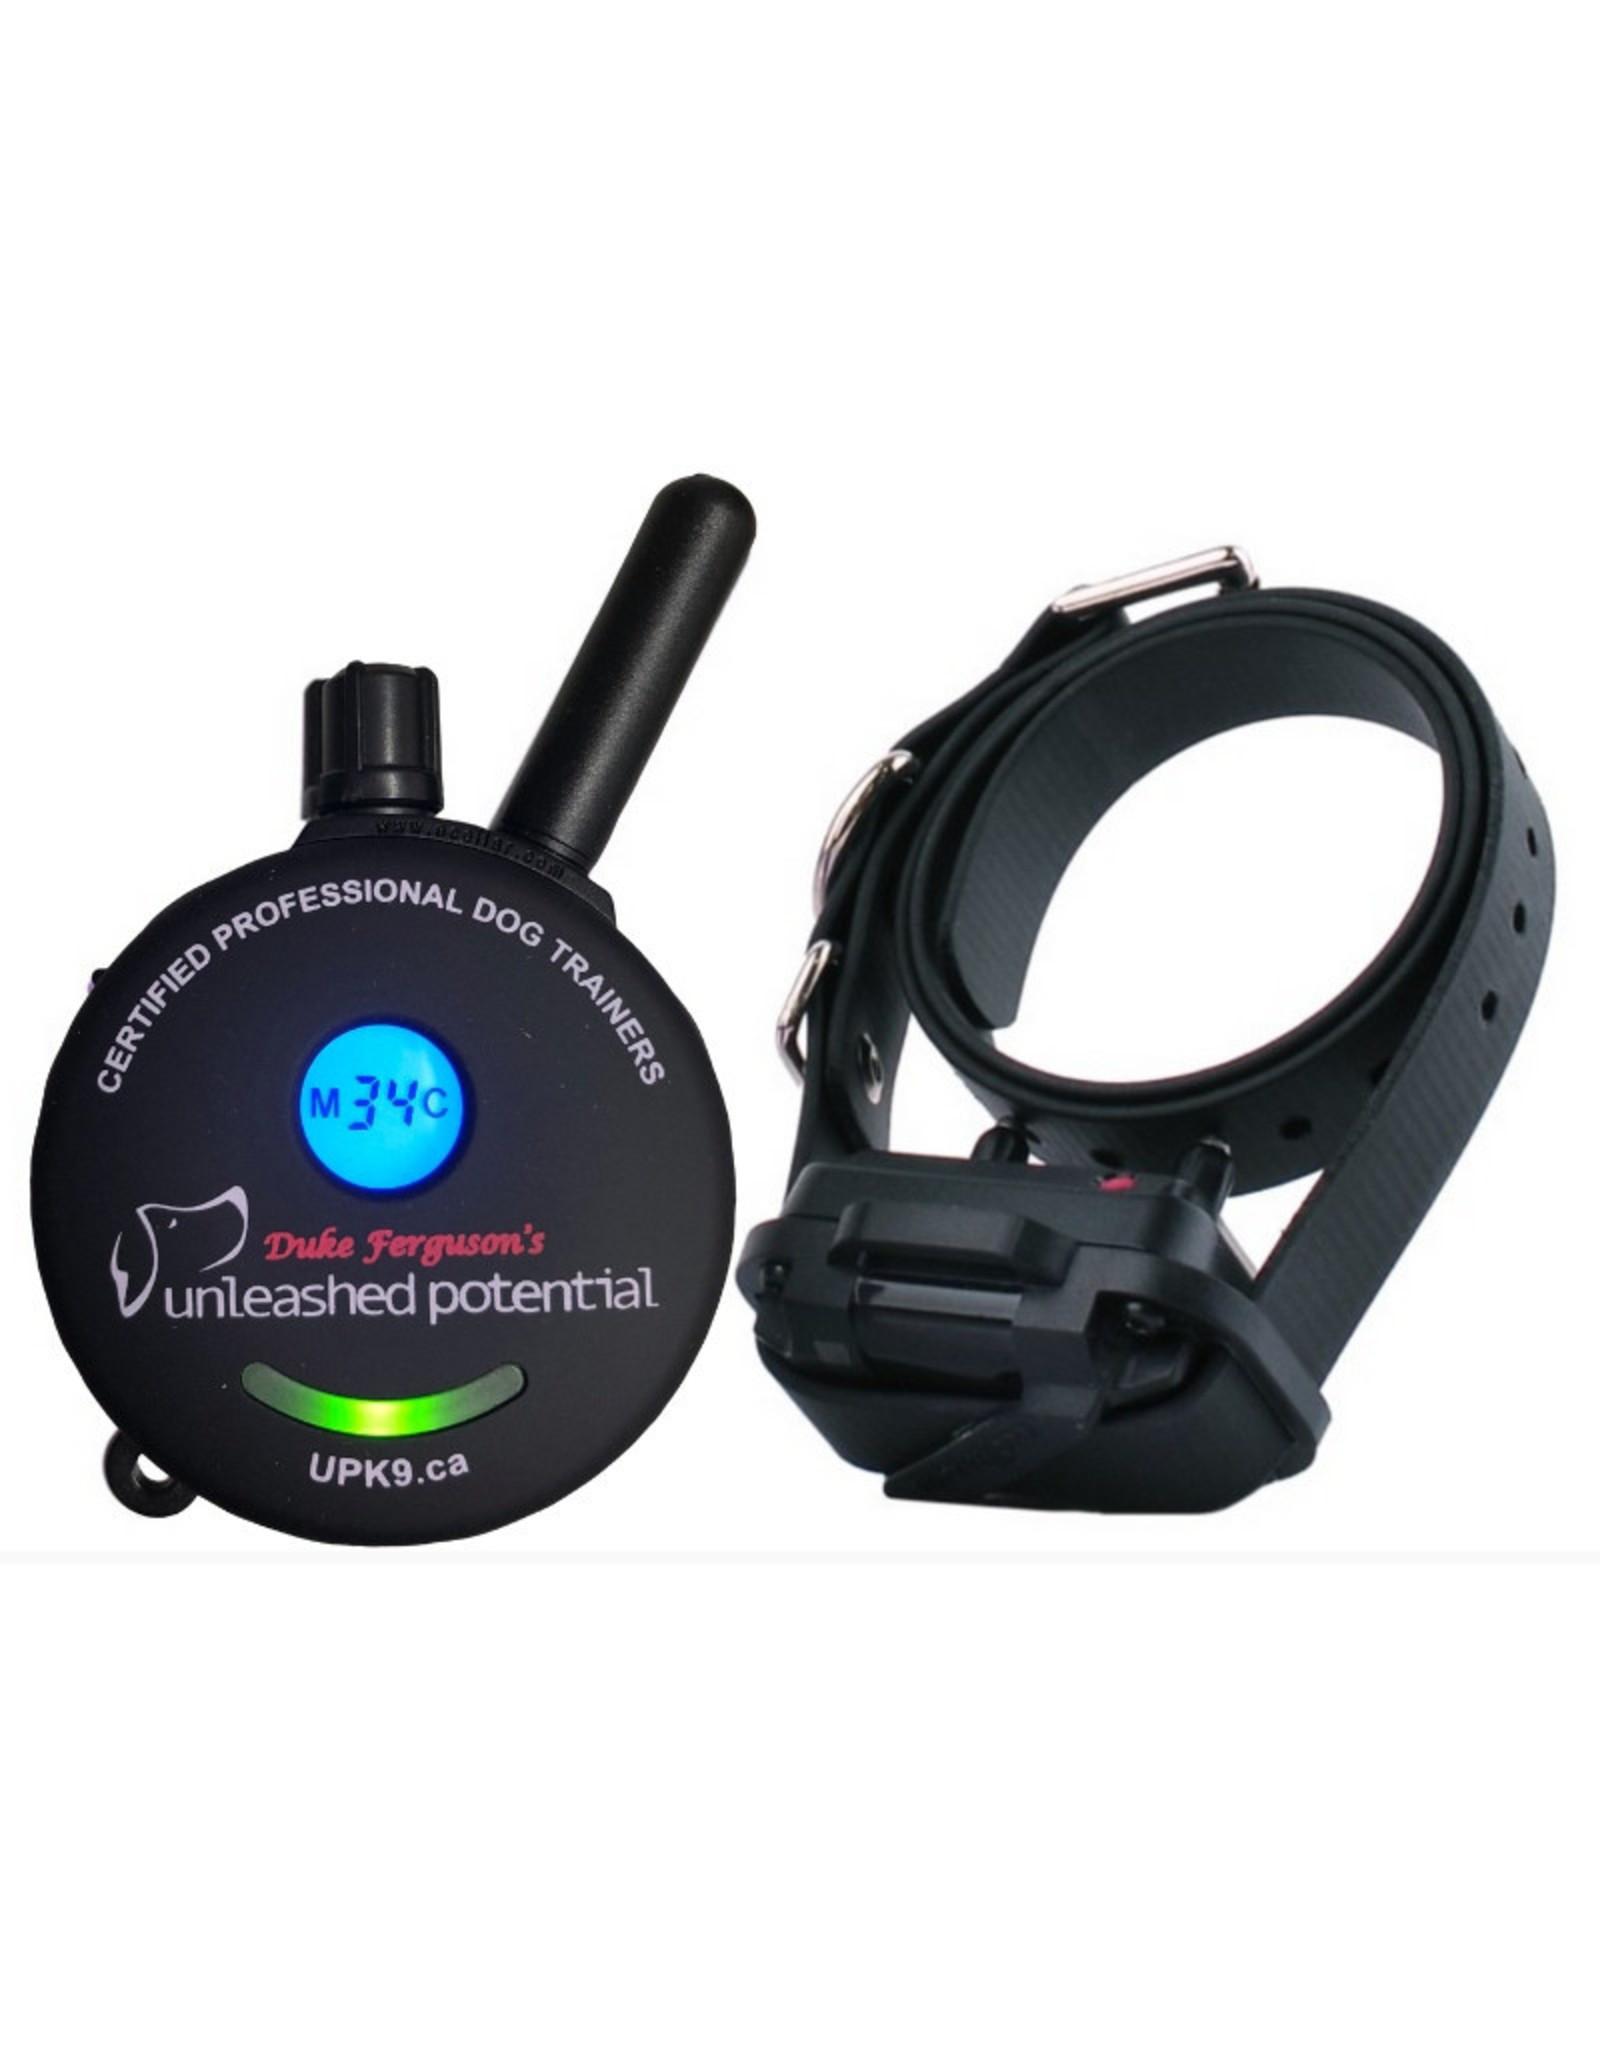 E-Collar Technologies ME-300 Micro Educator E-Collar System